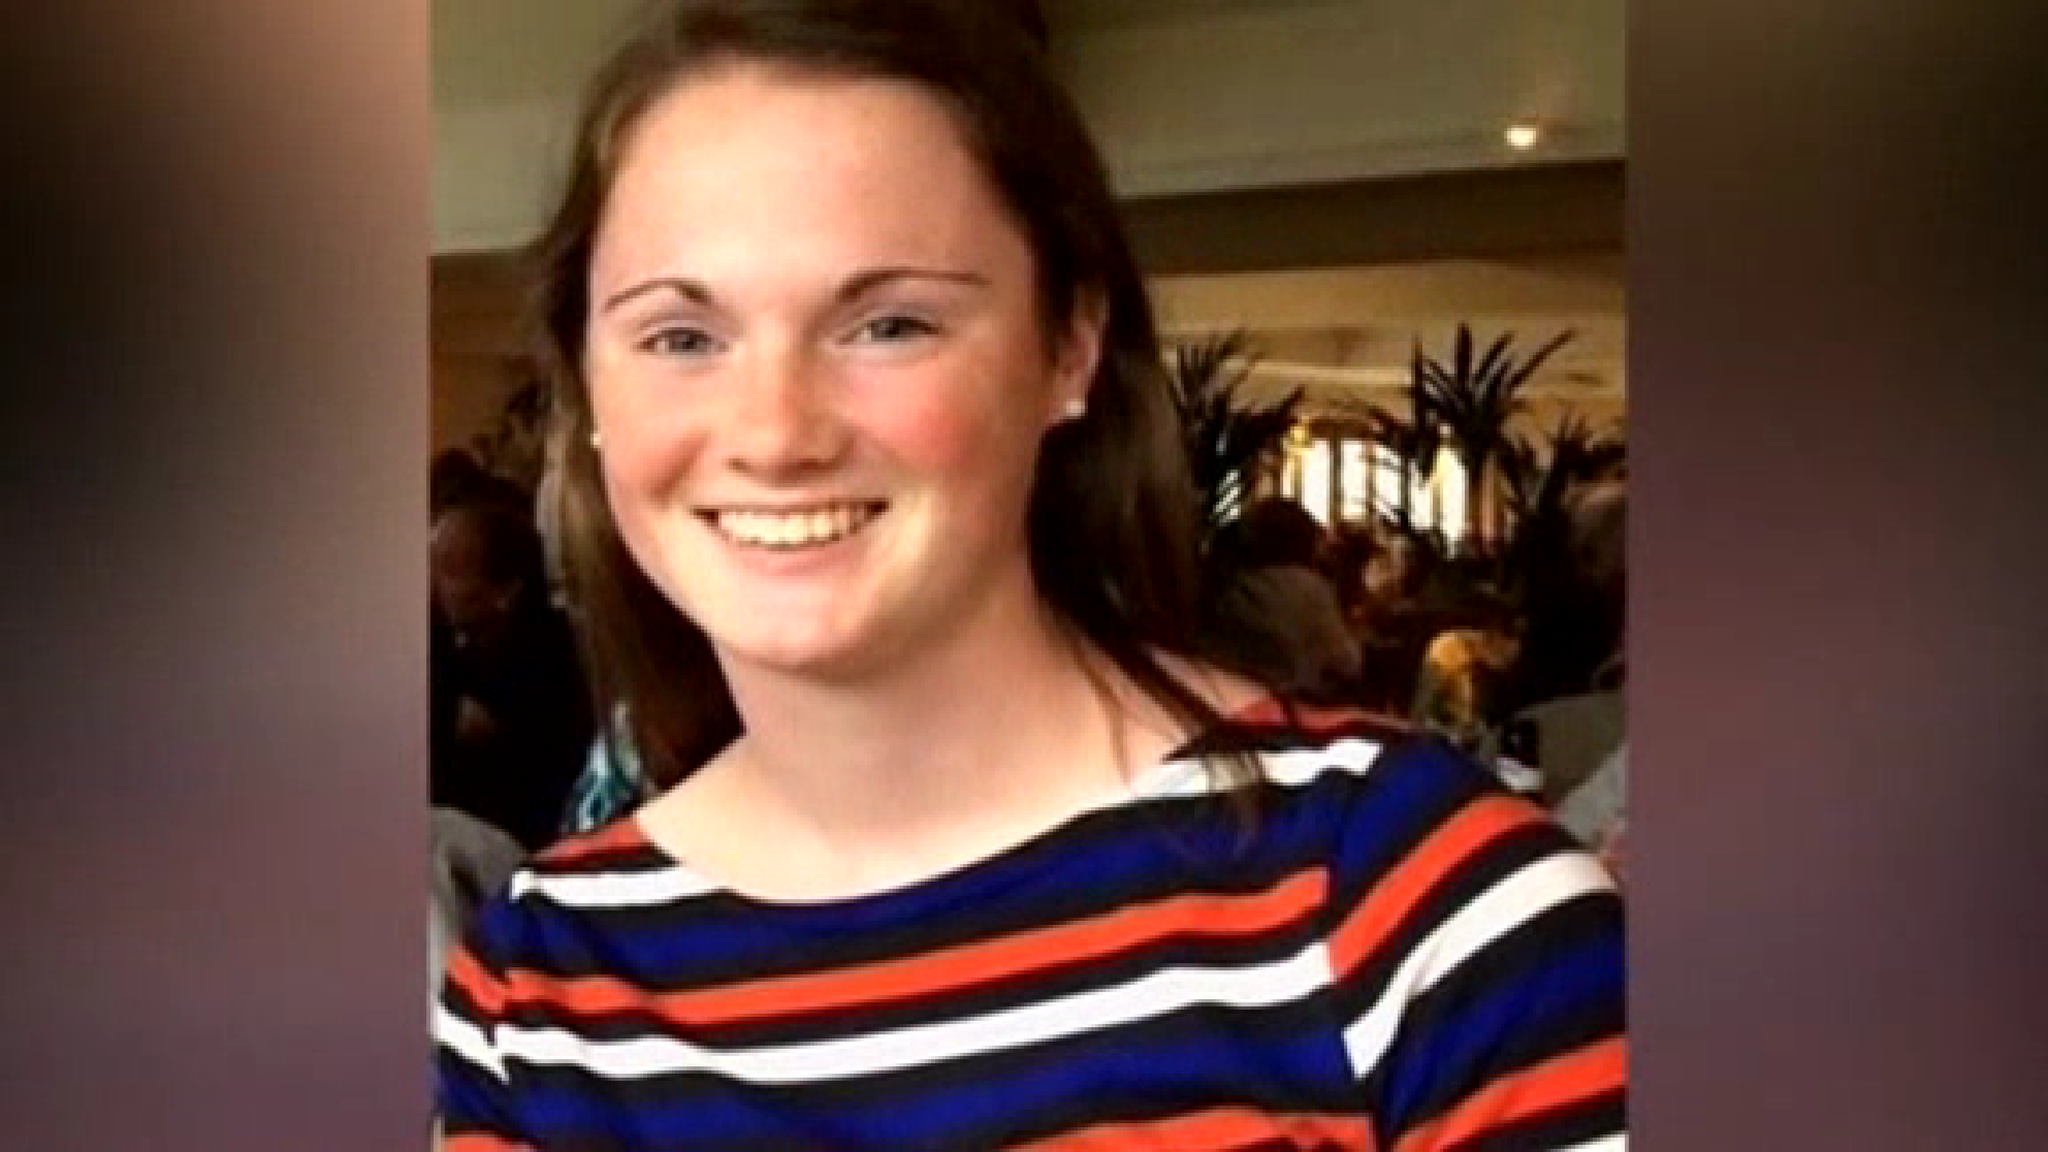 Police identify human remains as Hannah Graham's